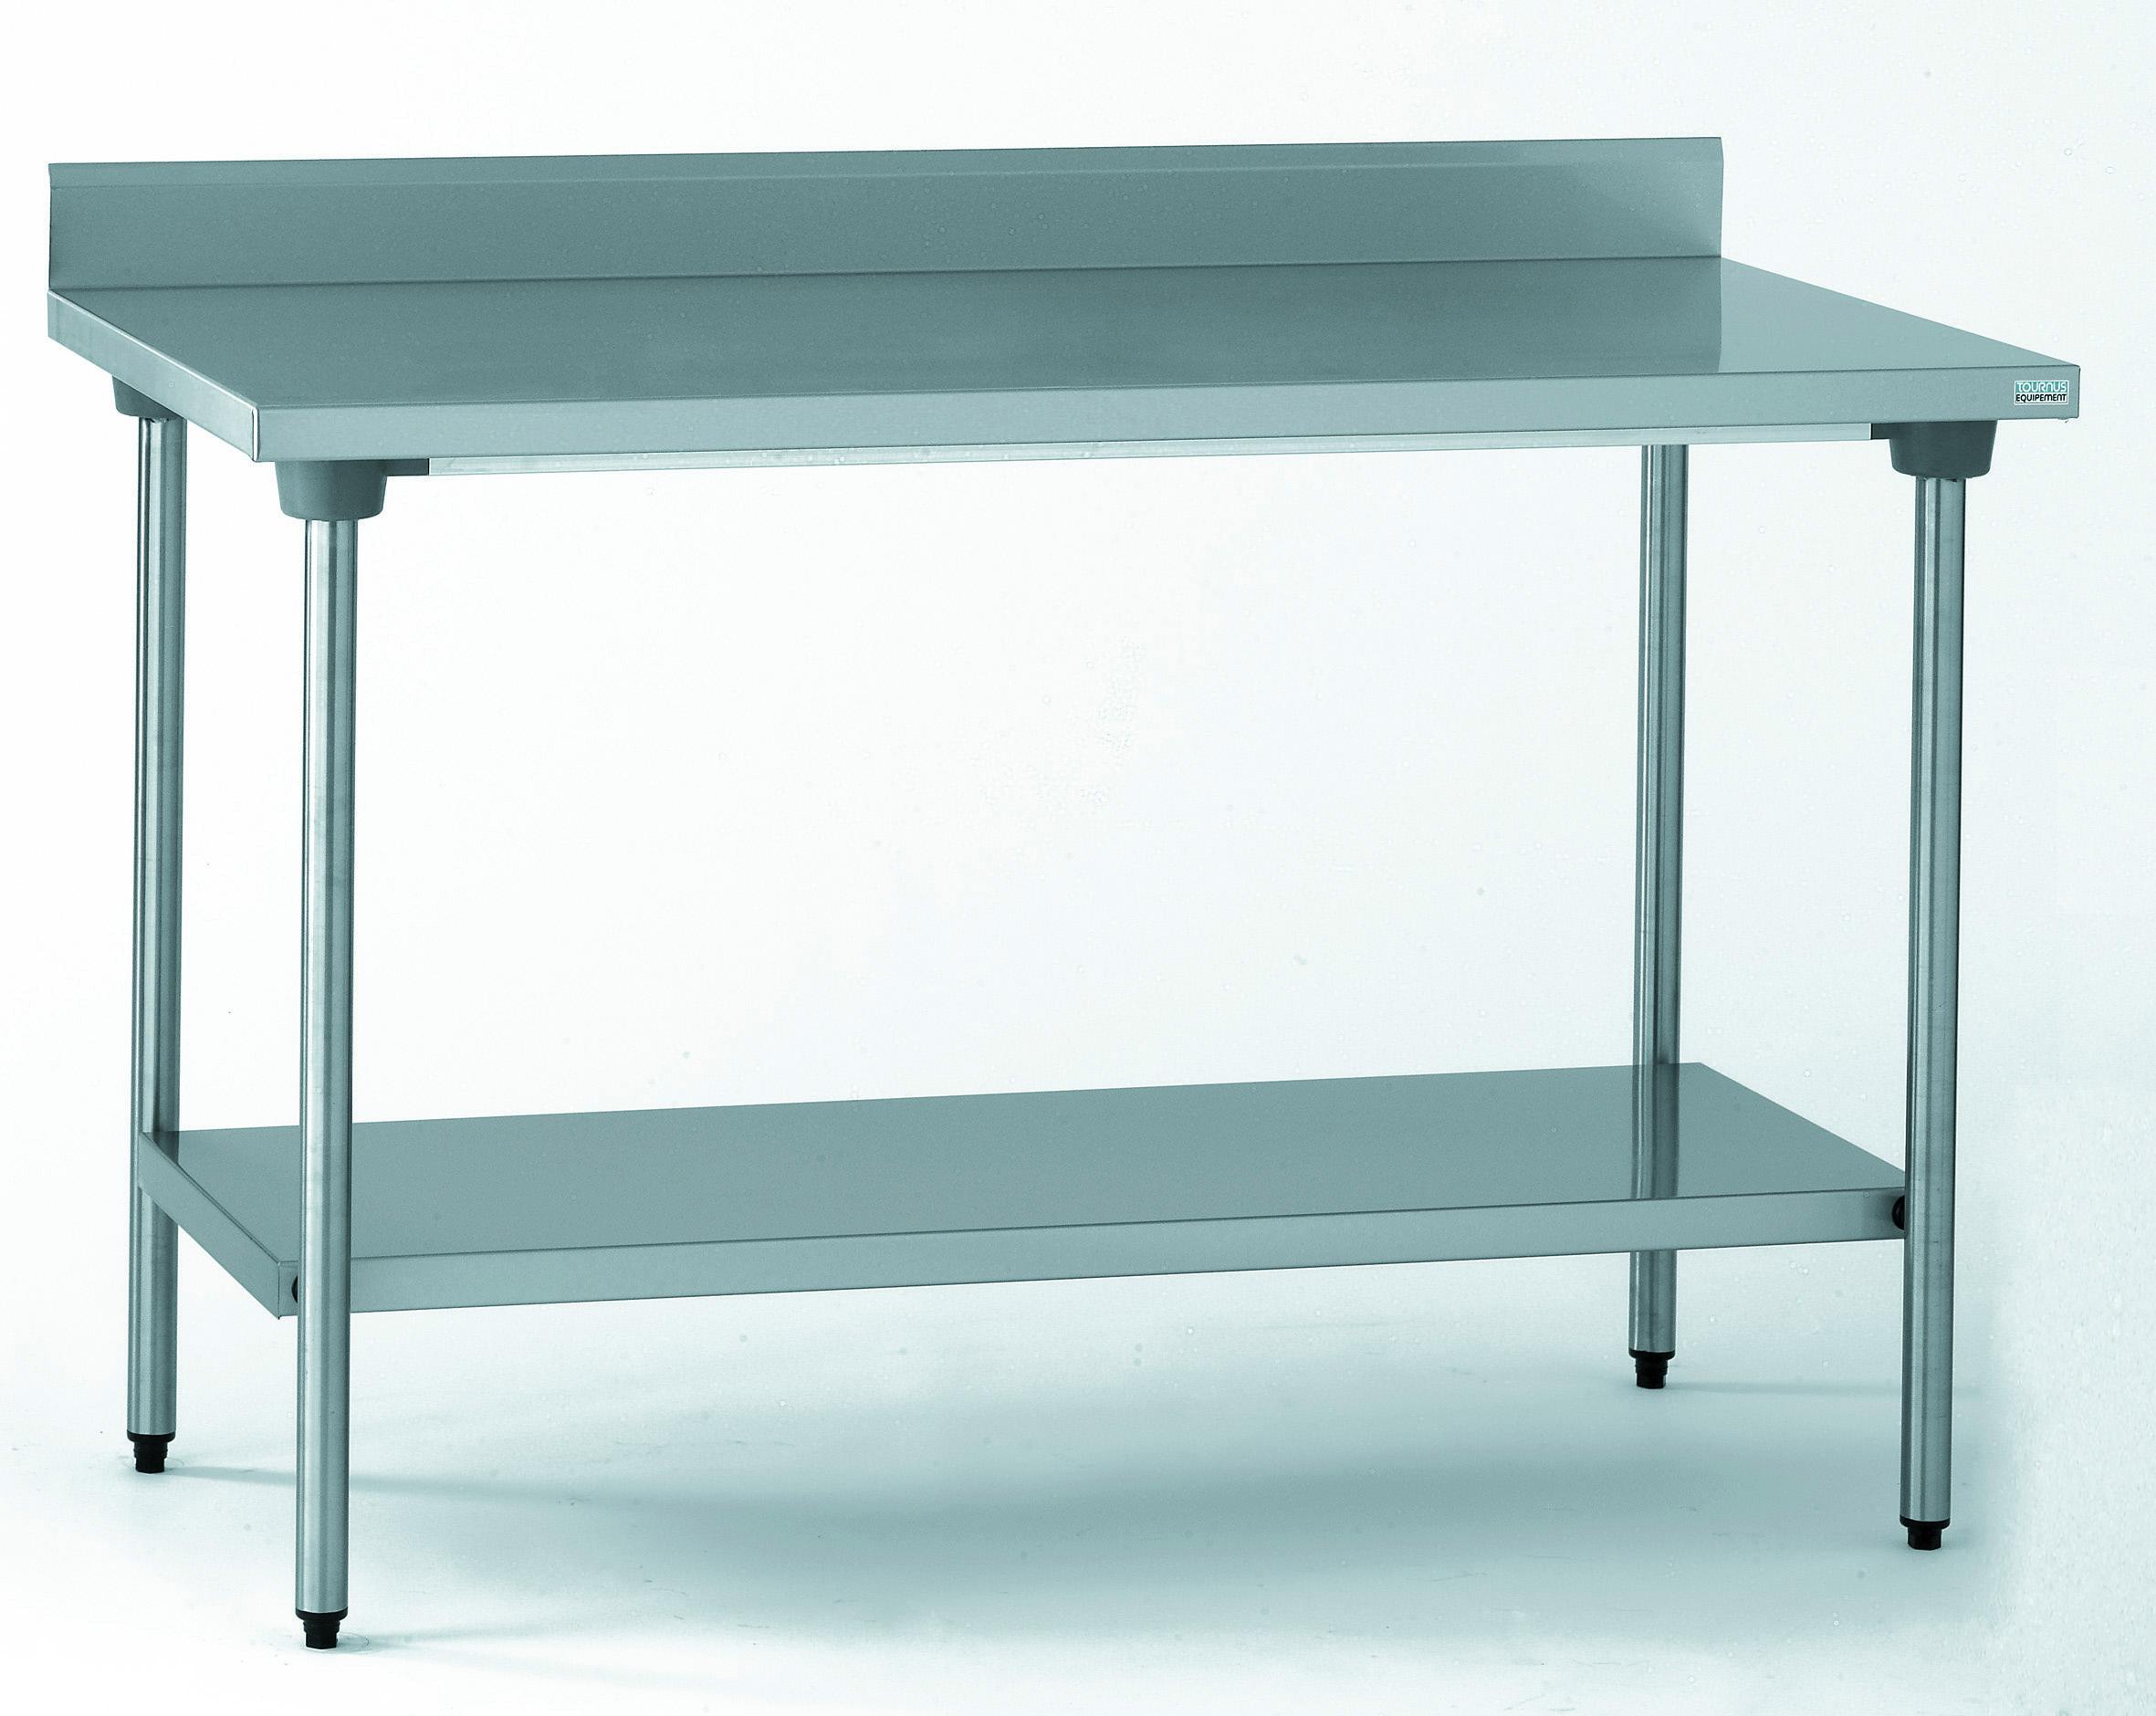 TABLE CHR ADOS+ETAG. 700X2000